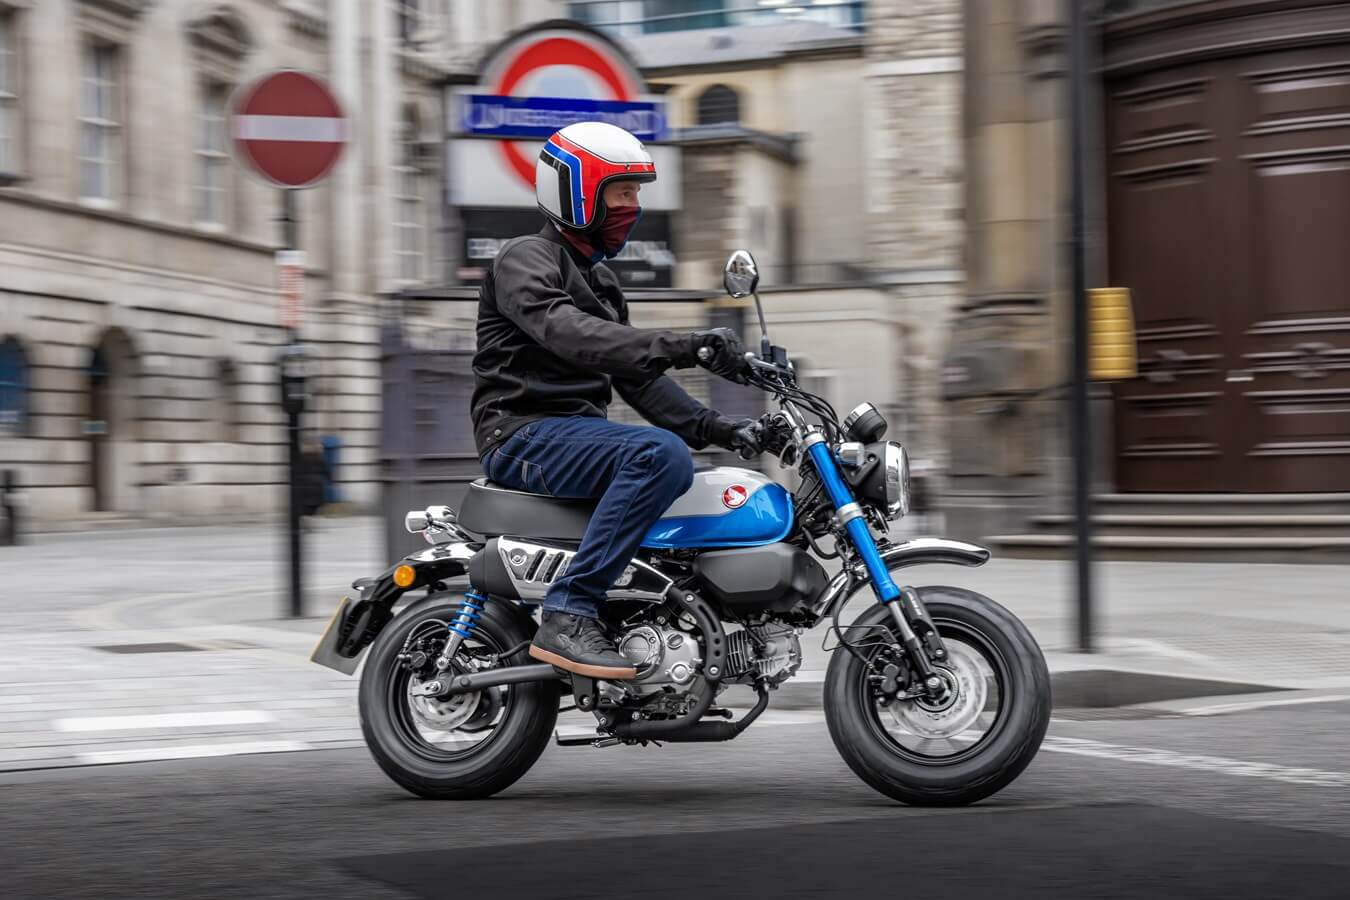 2022 Honda Monkey 125 Ride - Review, Specs, New Changes Explained + USA Information   125cc Motorcycle / Mini Bike   miniMOTO Vintage / Retro Bike